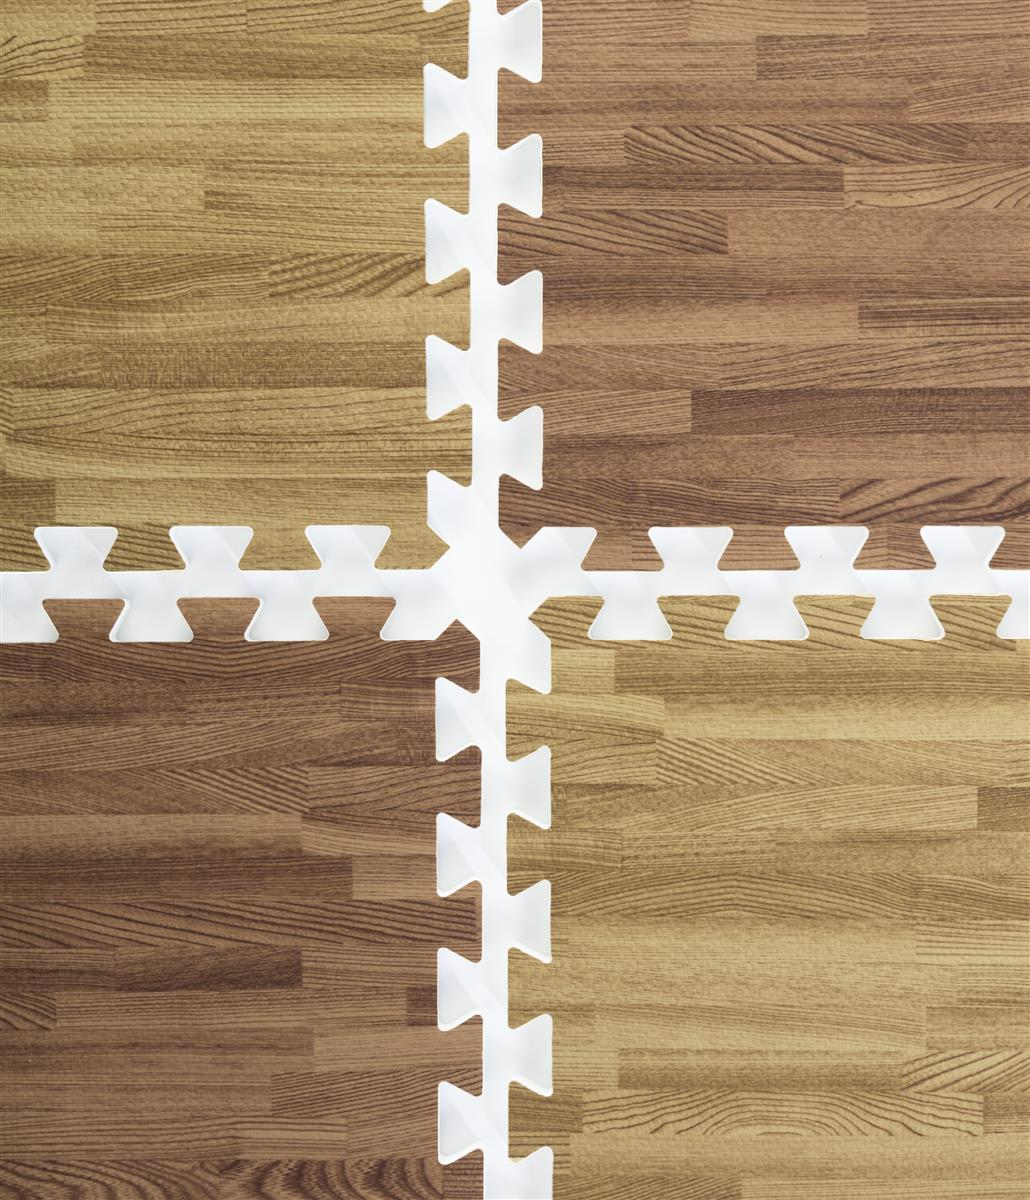 Dark Oak Amp Light Oak Wood Grain Floor Mats 26 2 X 2 Tiles